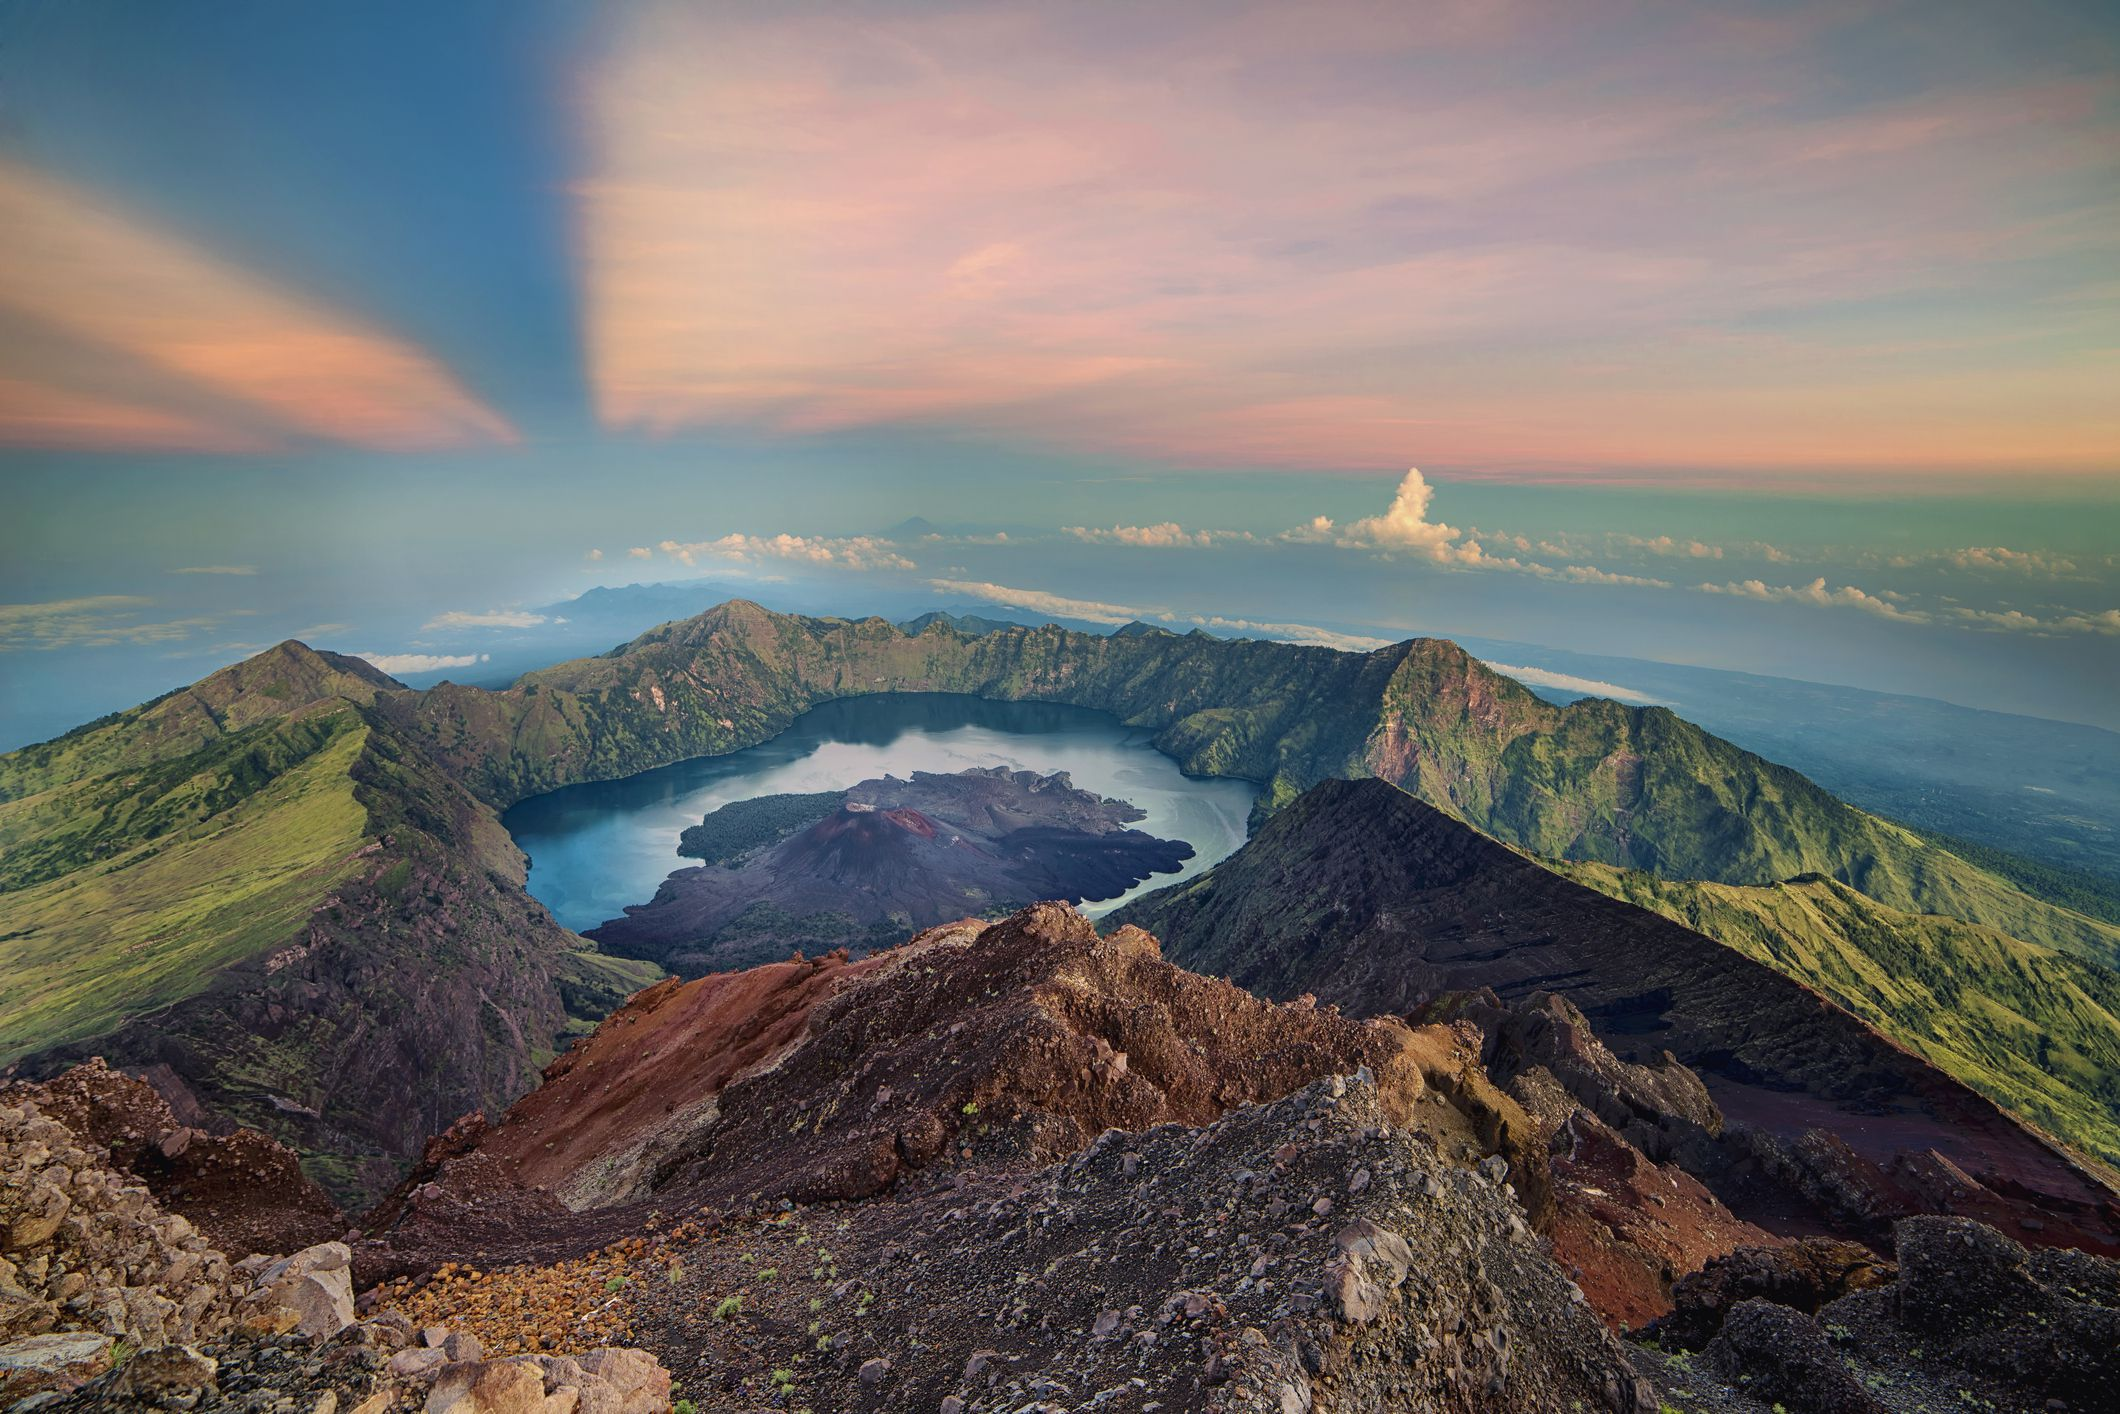 Climbing mount rinjani package lombok island indonesia about us - Climbing Mount Rinjani Package Lombok Island Indonesia About Us 35